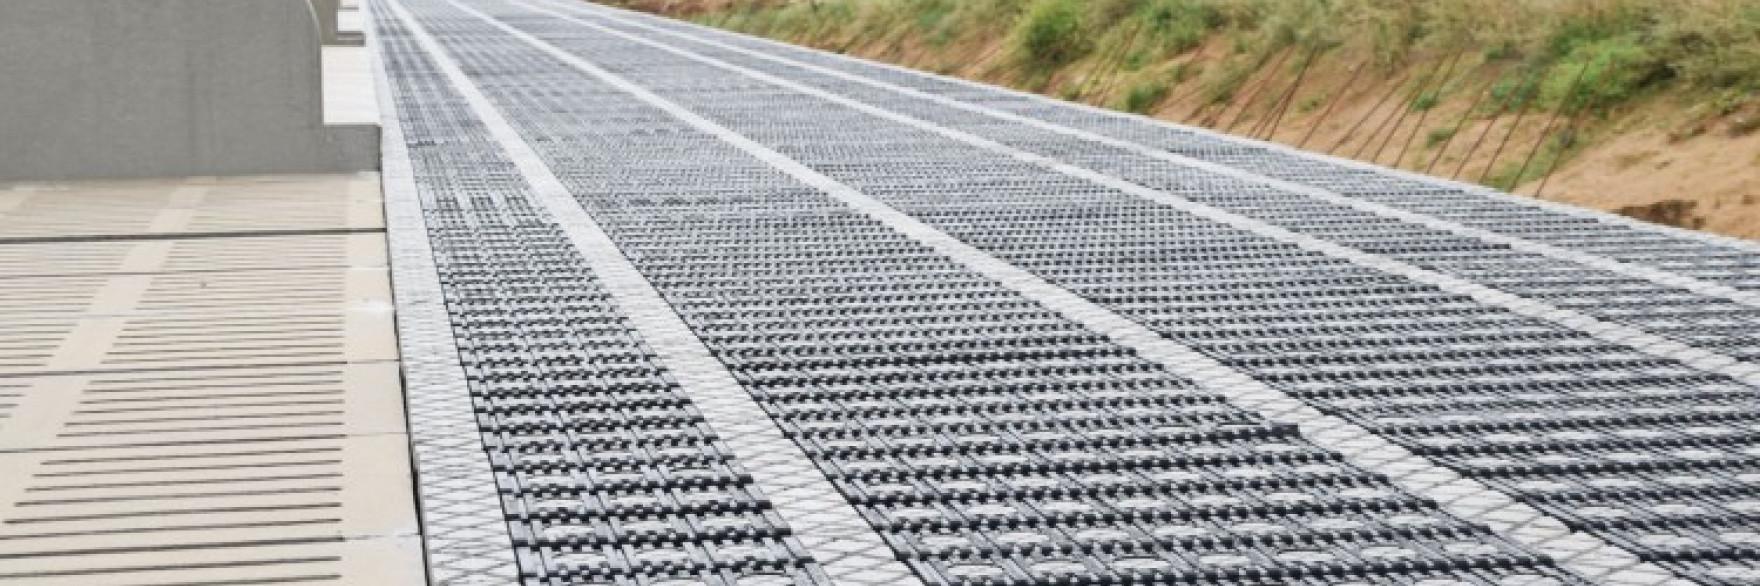 Element beton en rubber